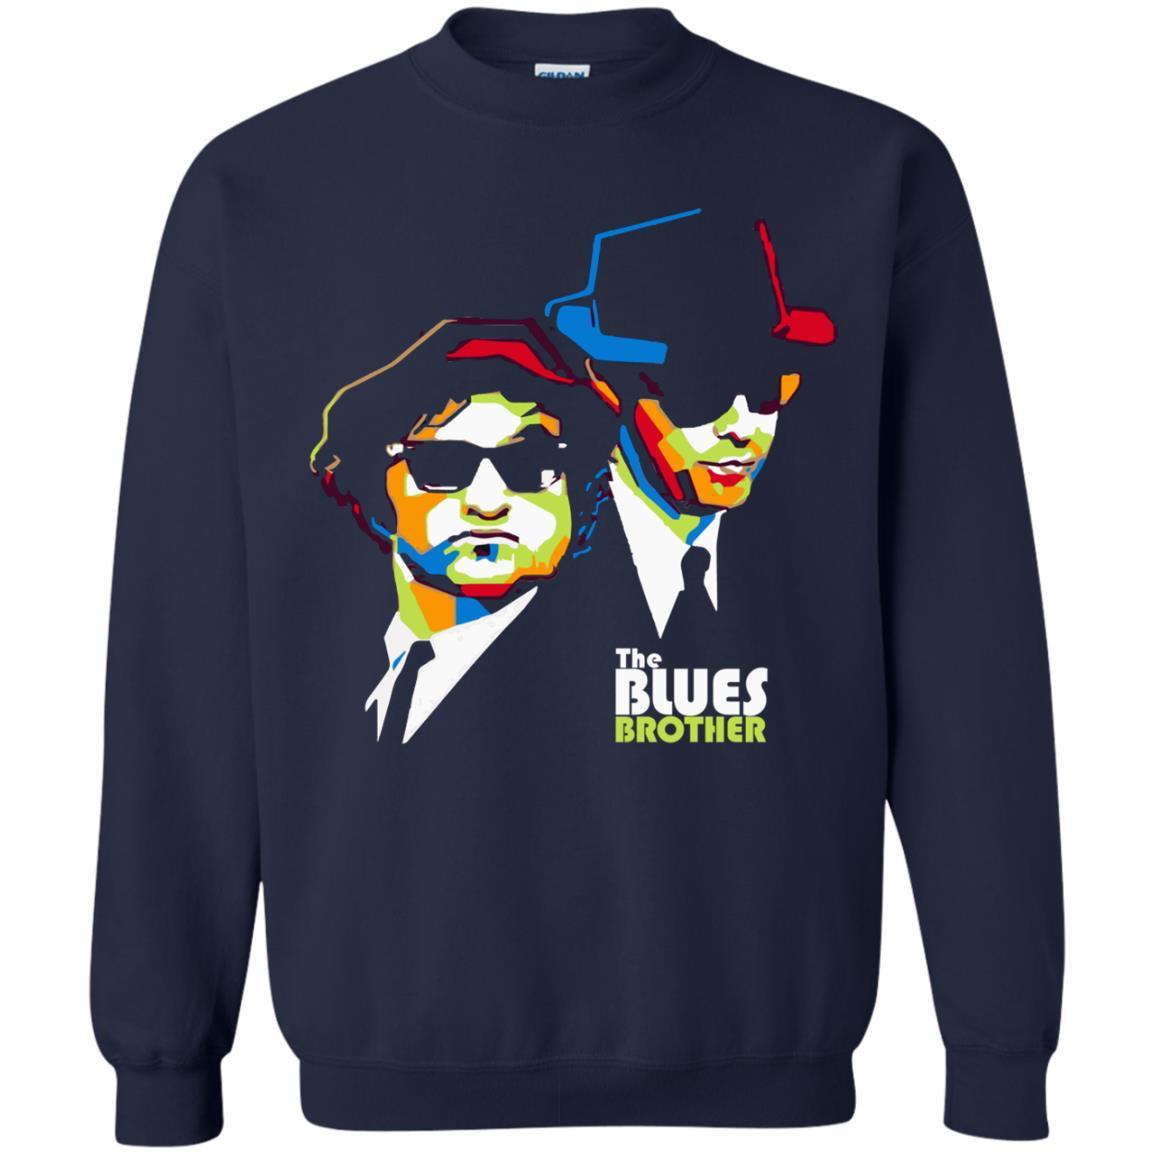 image 646 - The Blues Brother Shirt, Sweatshirt, Hoodie